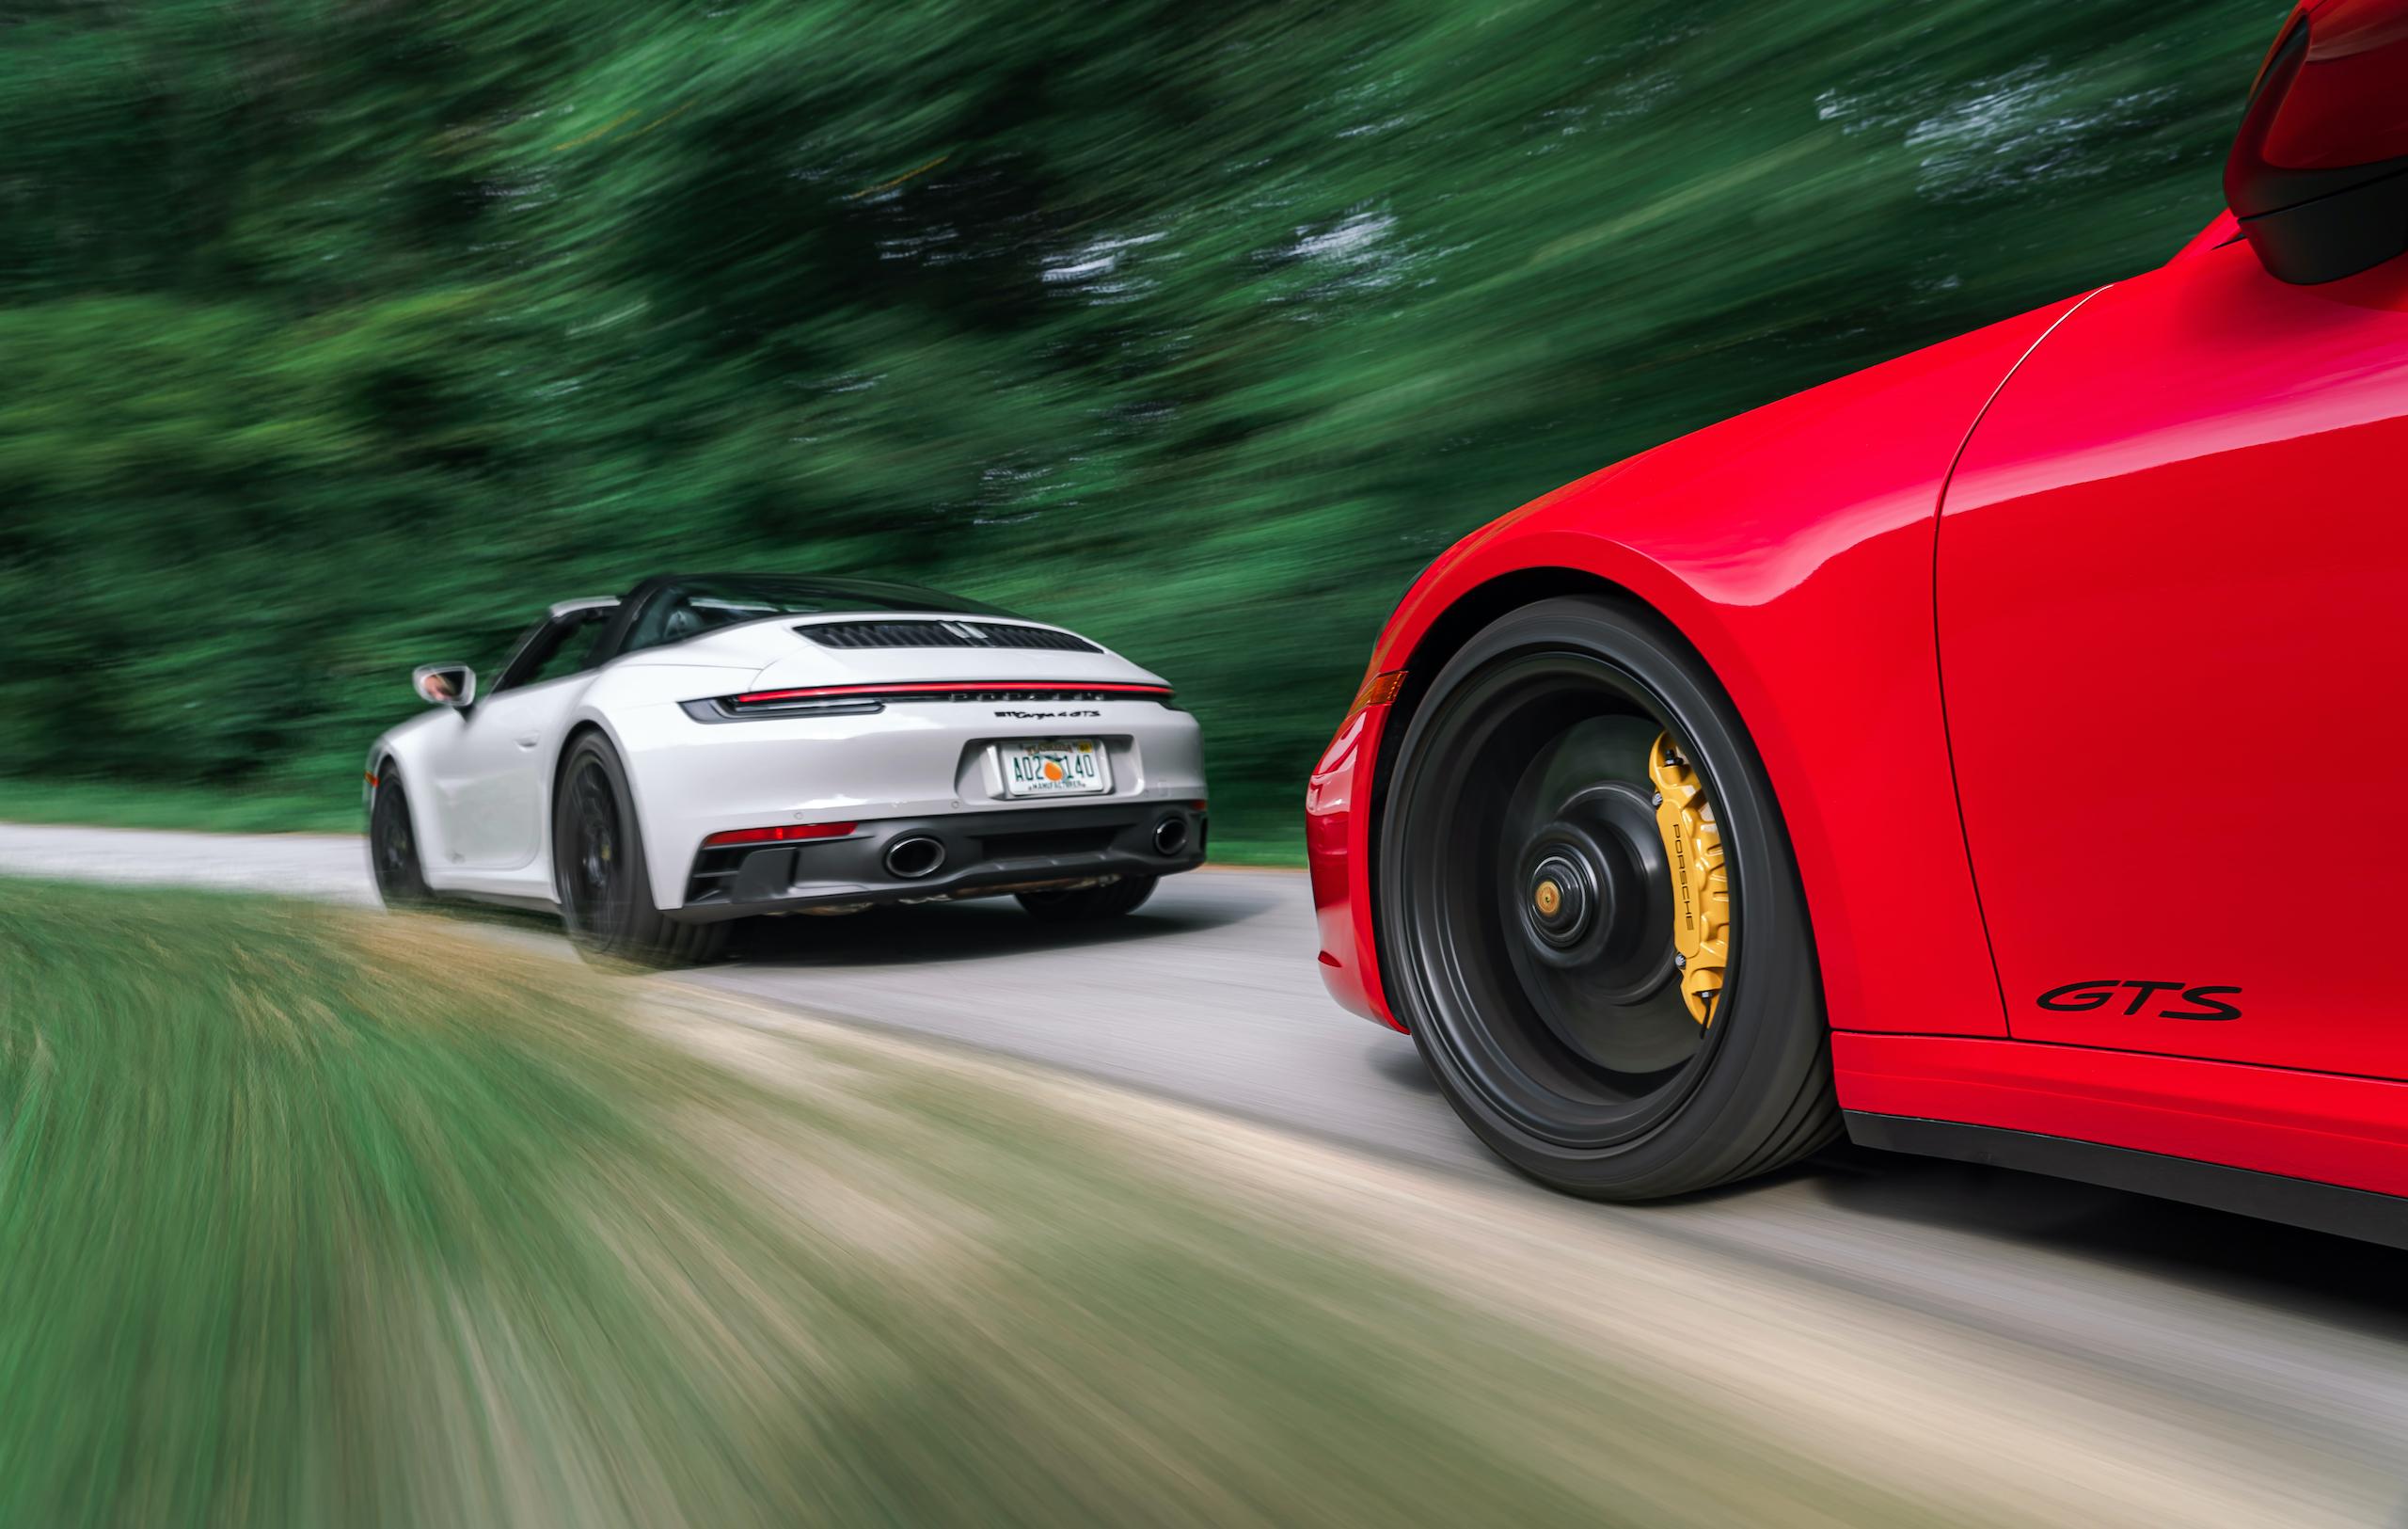 Porsche 911 GTS and Targa 4 GTS action